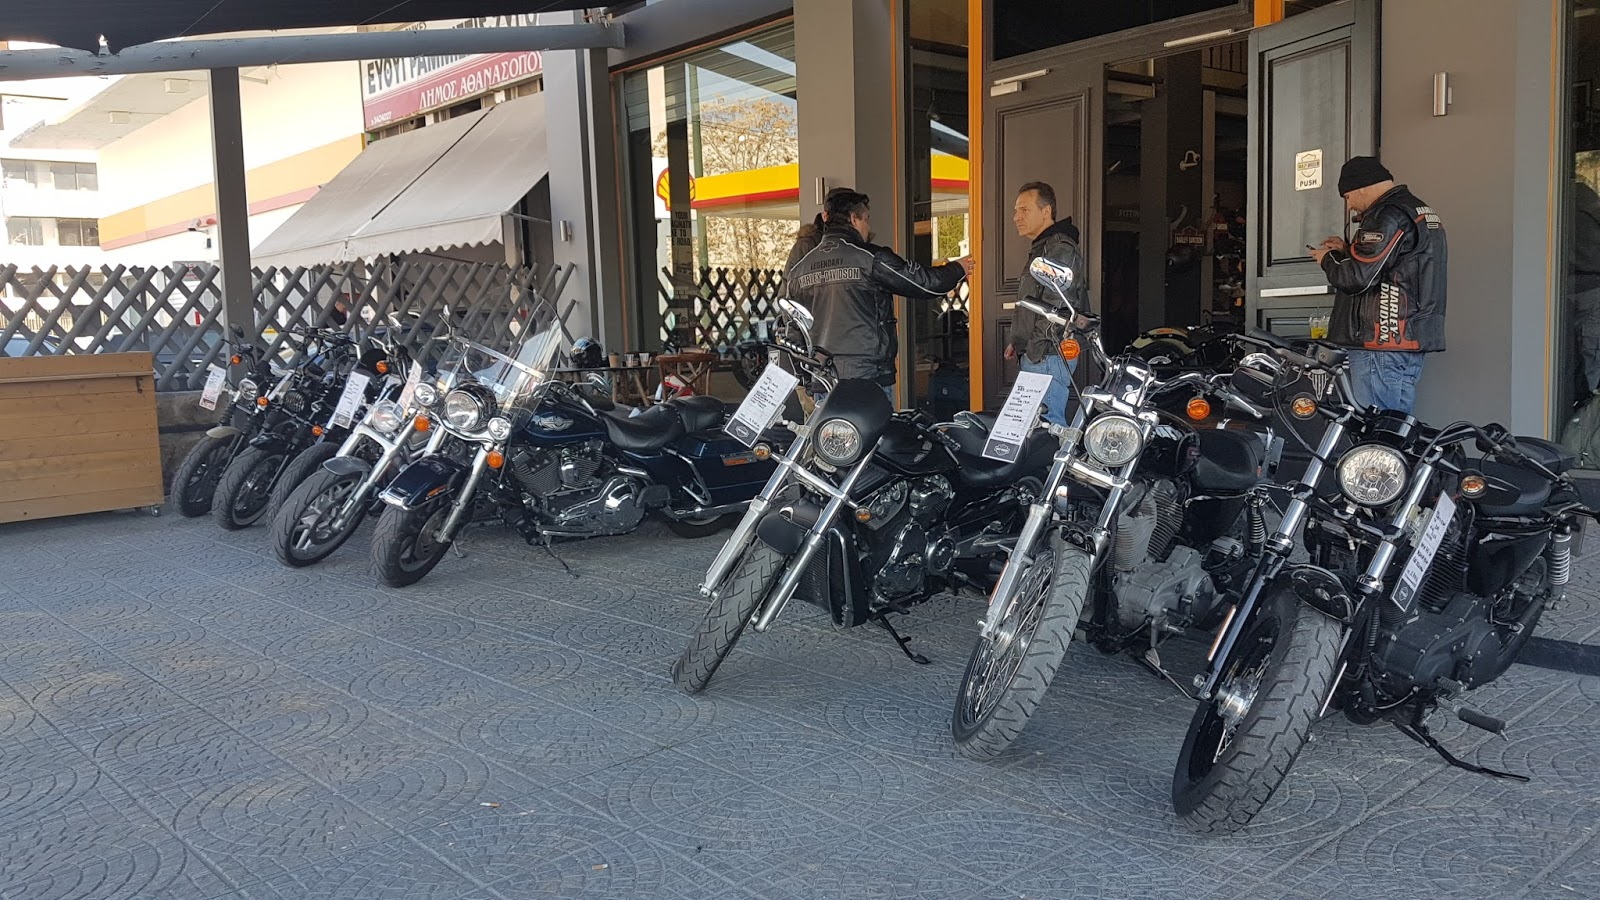 HAD3 Γιατί η Ρόδος γέμισε Harley Davidson;